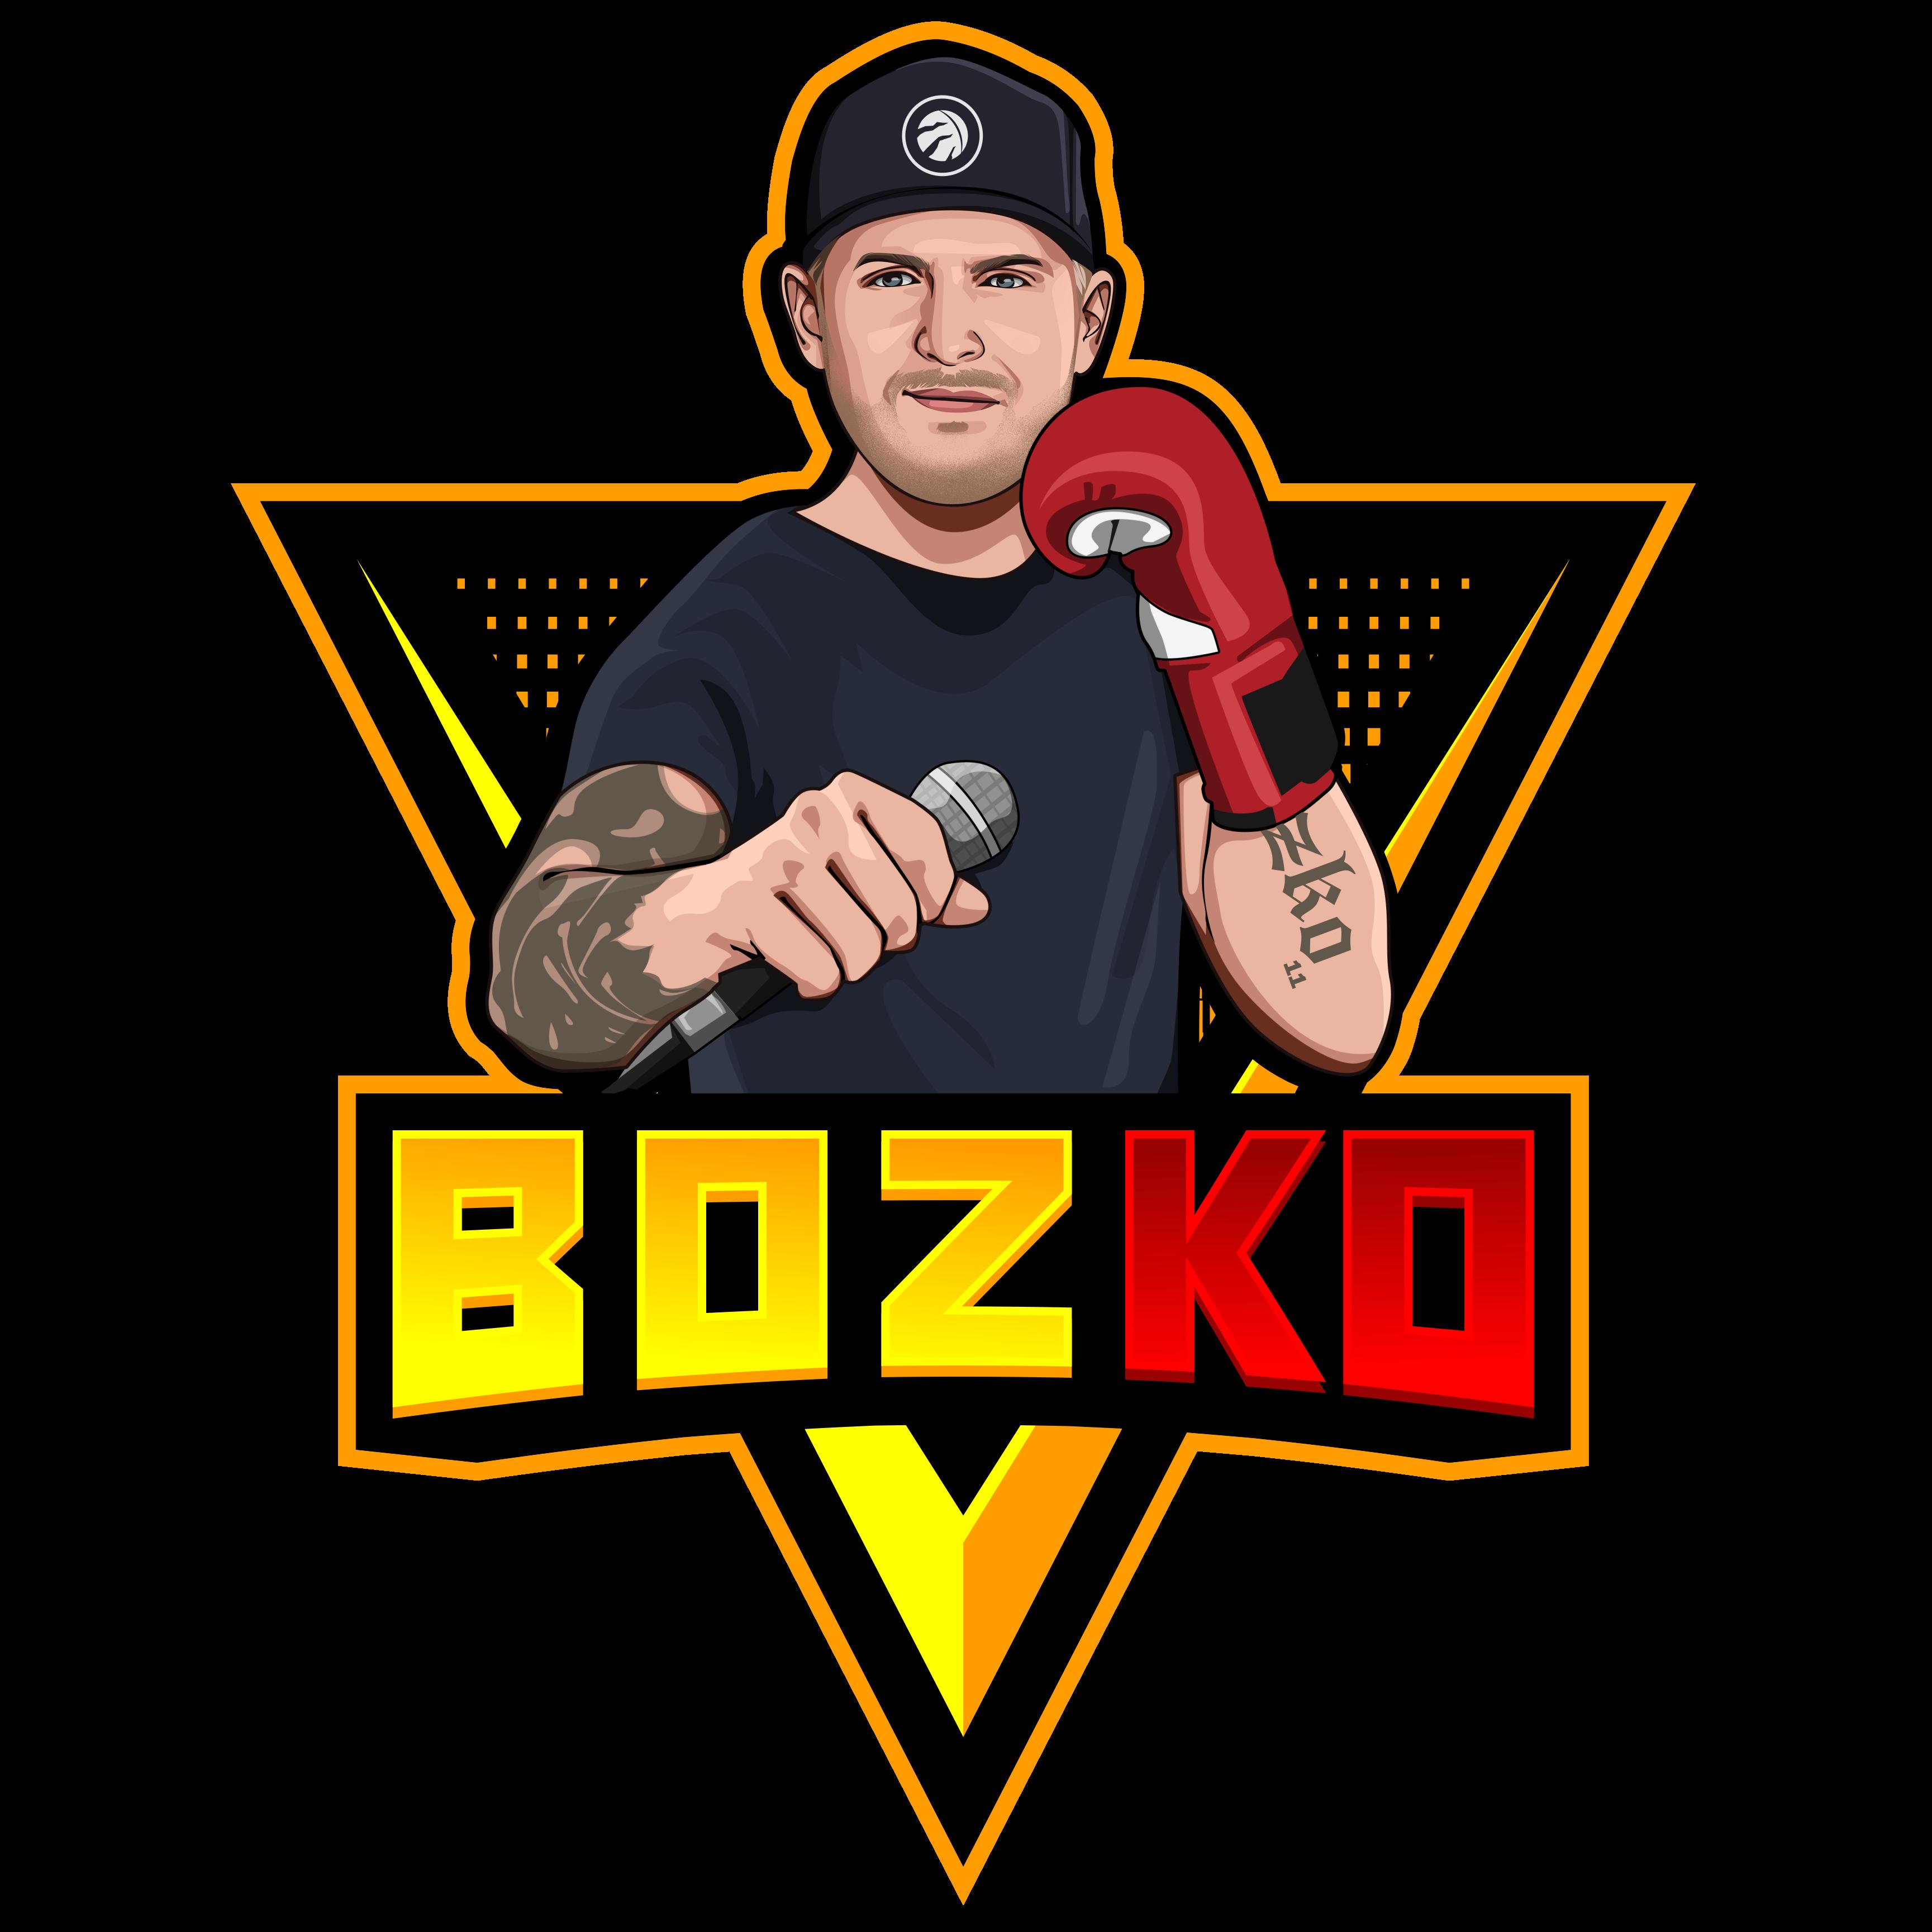 Nouveau EP disponible (Bozko) Profile Image | Linktree